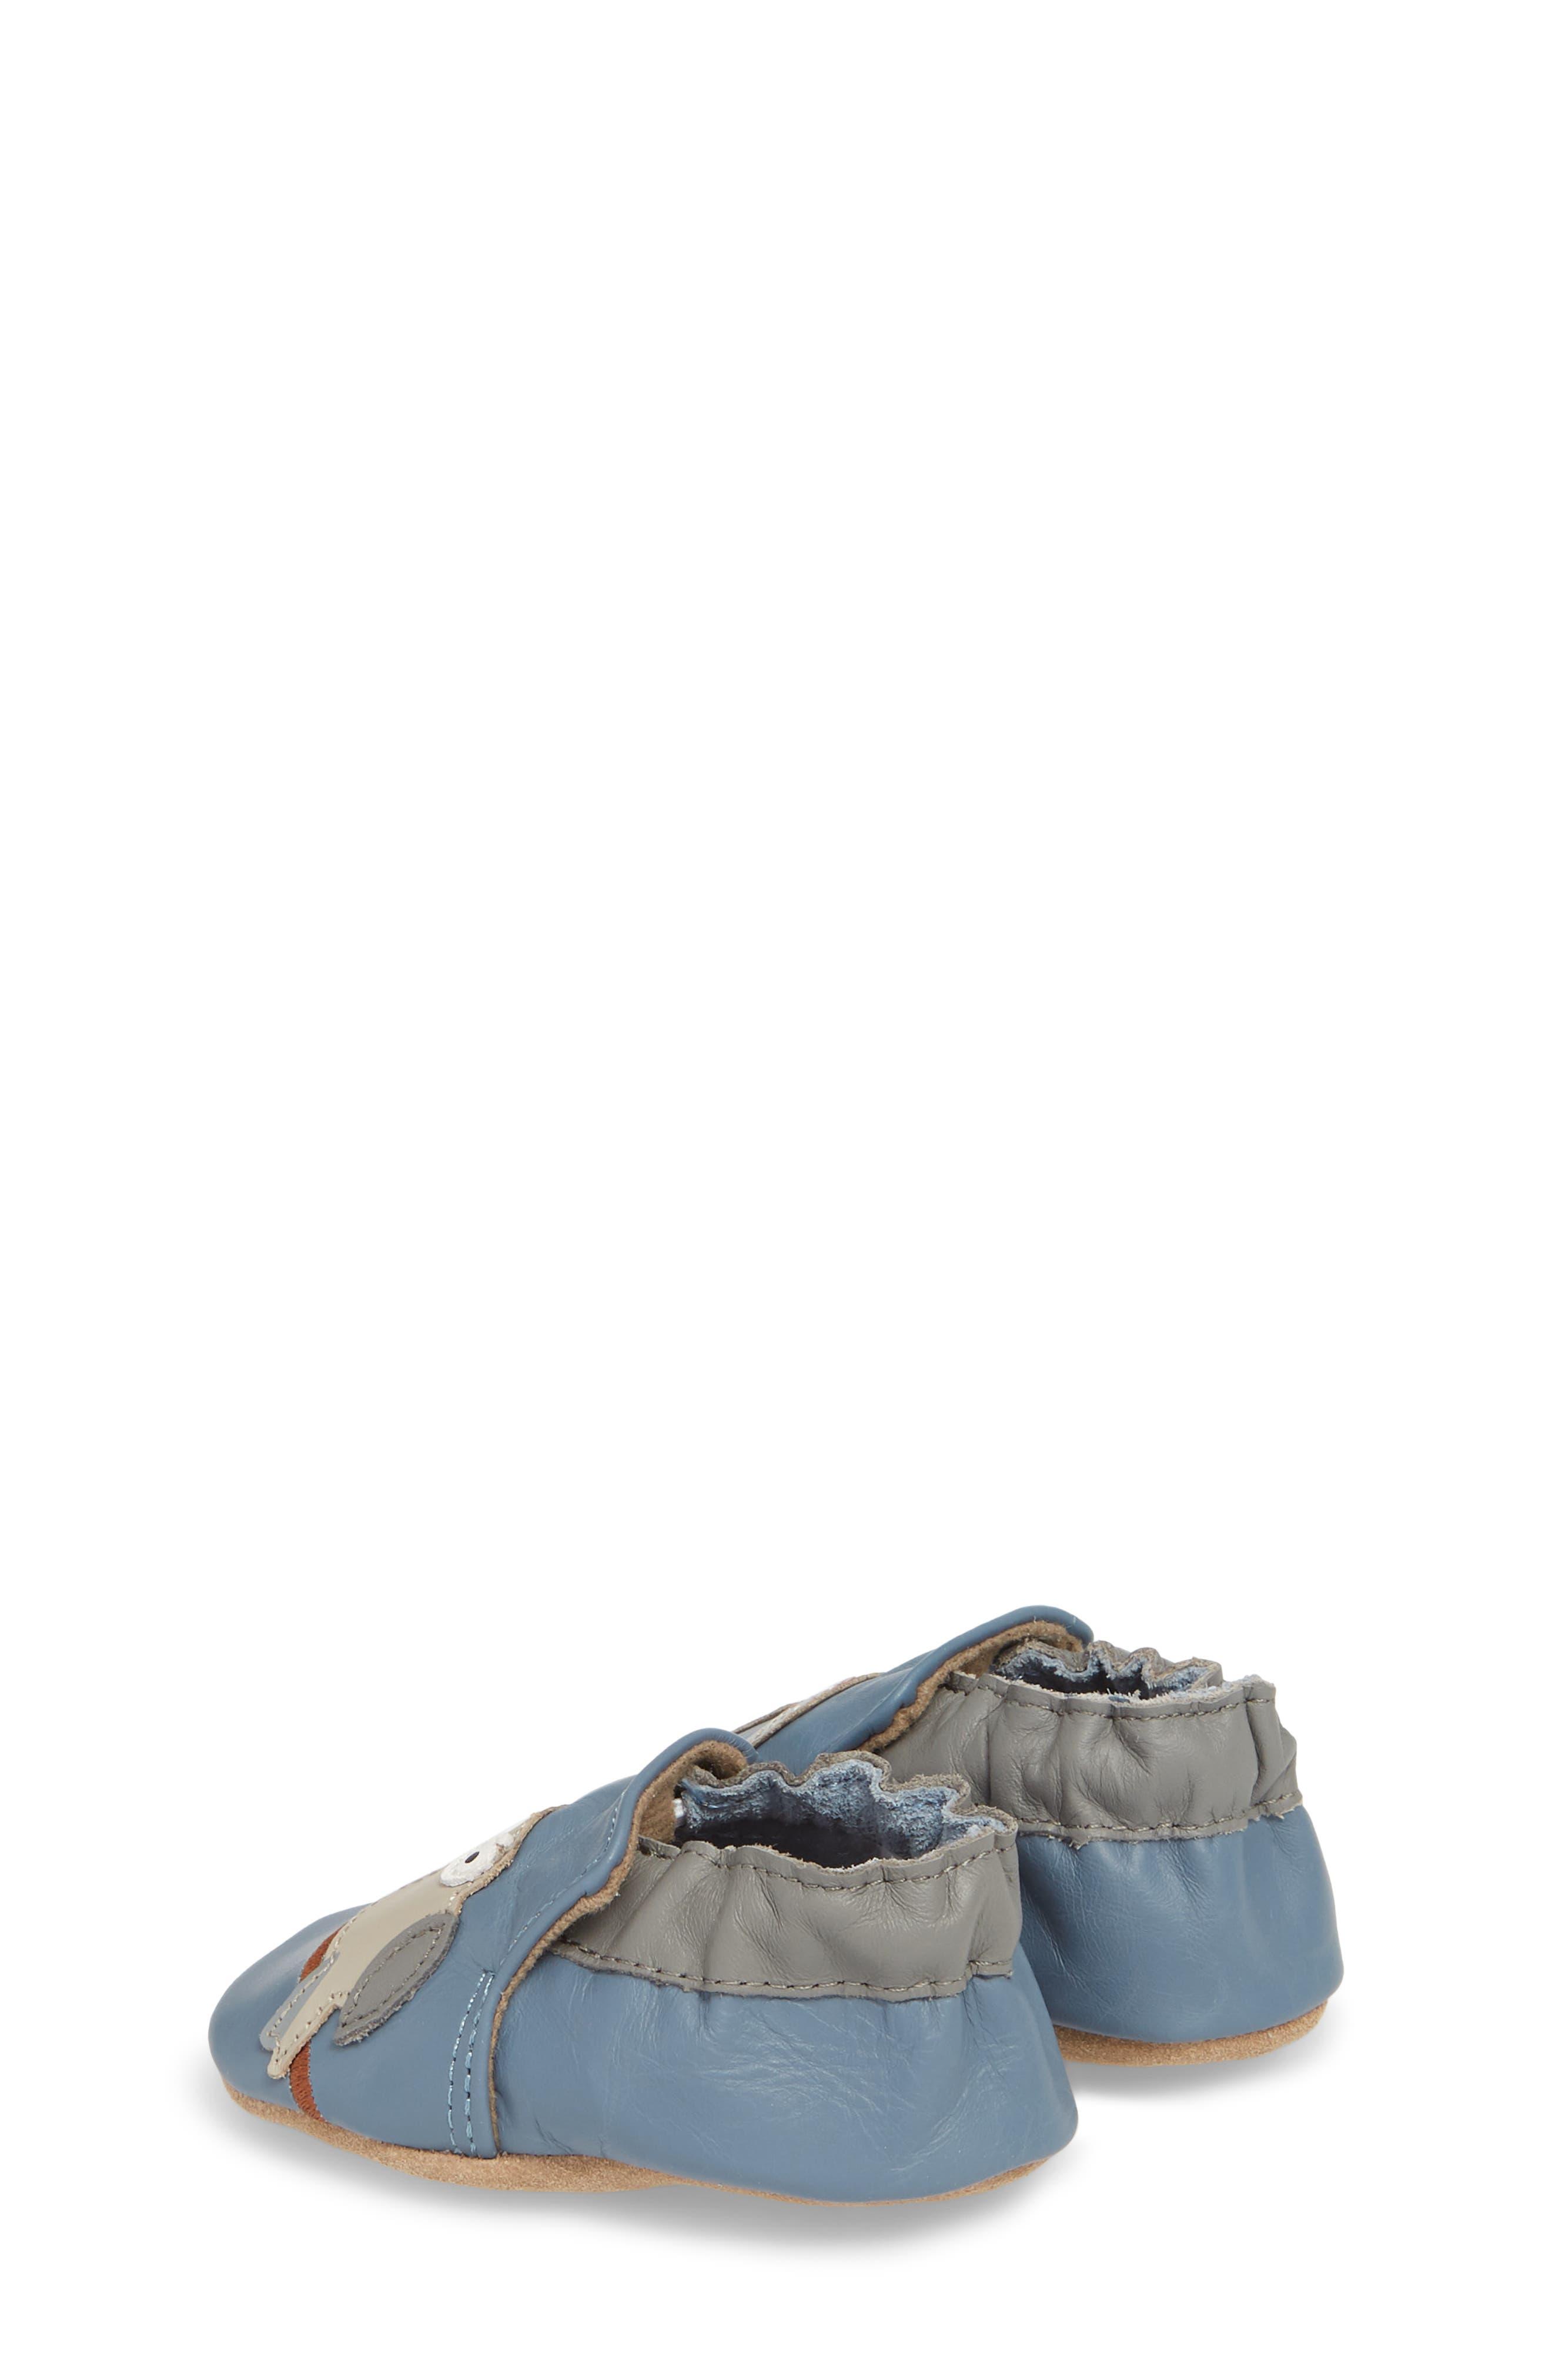 Toucan Tom Moccasin Crib Shoe,                             Alternate thumbnail 2, color,                             450